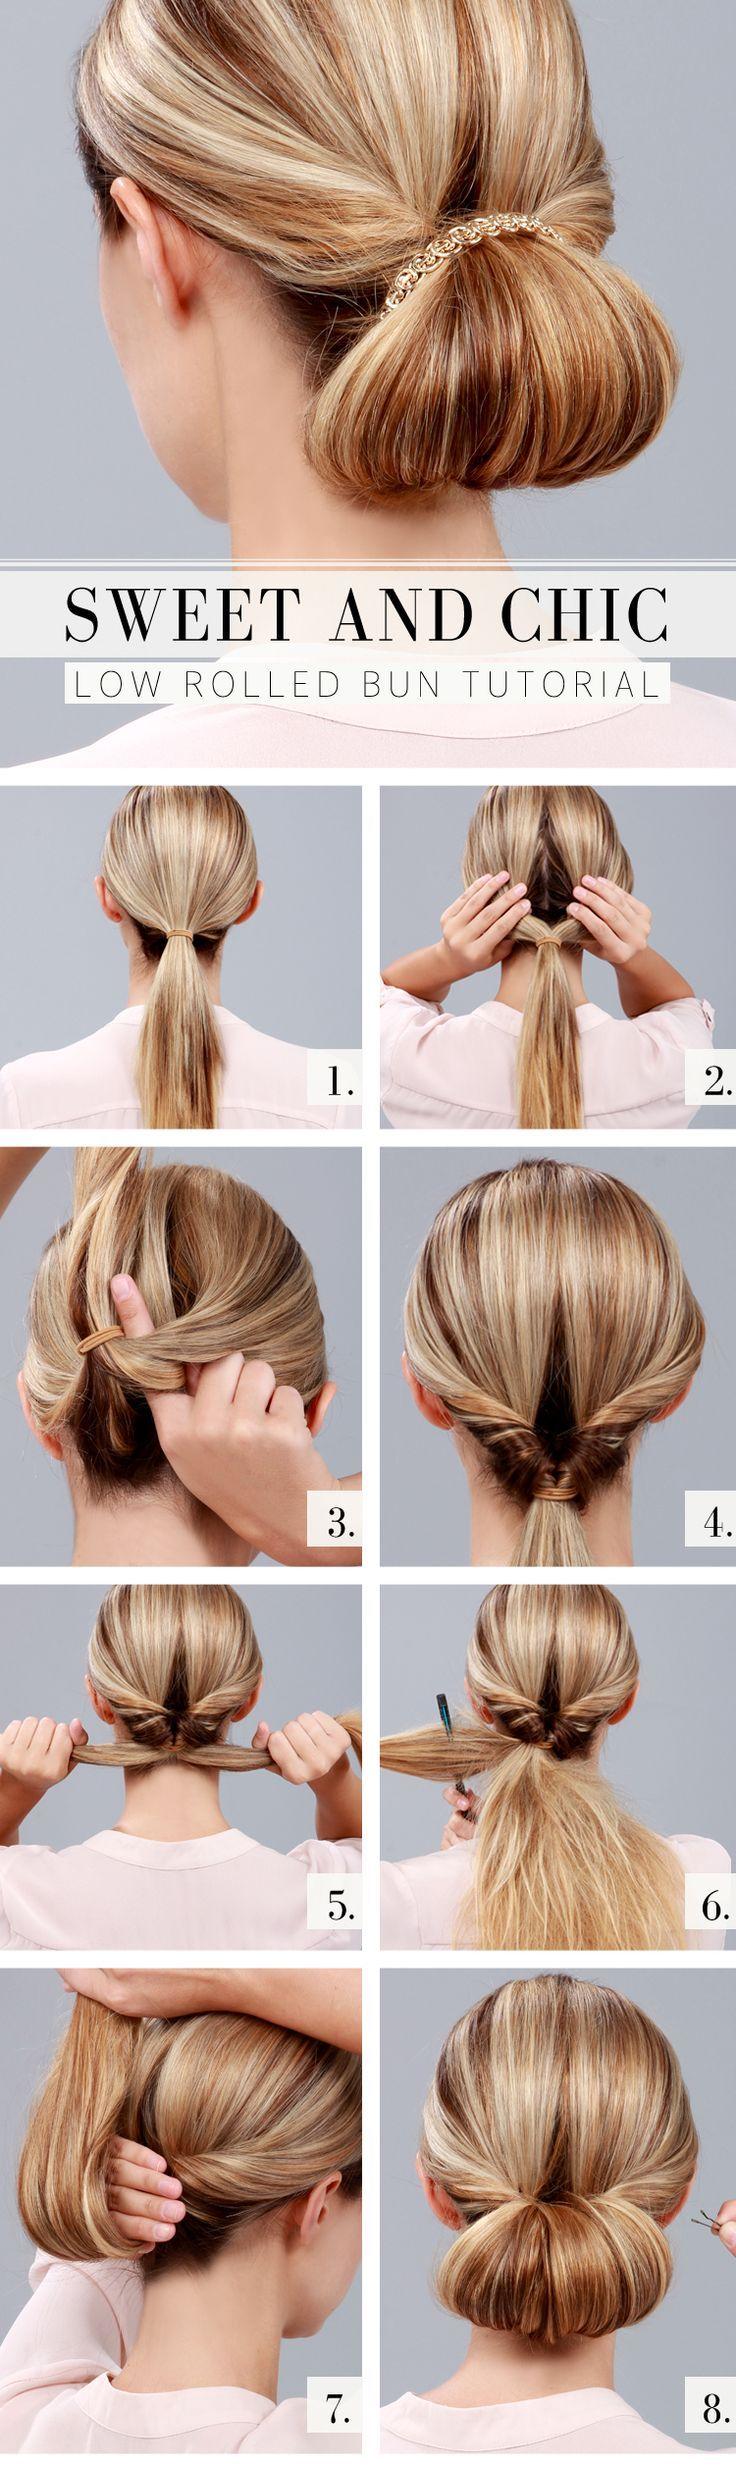 step by step tutorial for beautiful hair updos bun tutorials